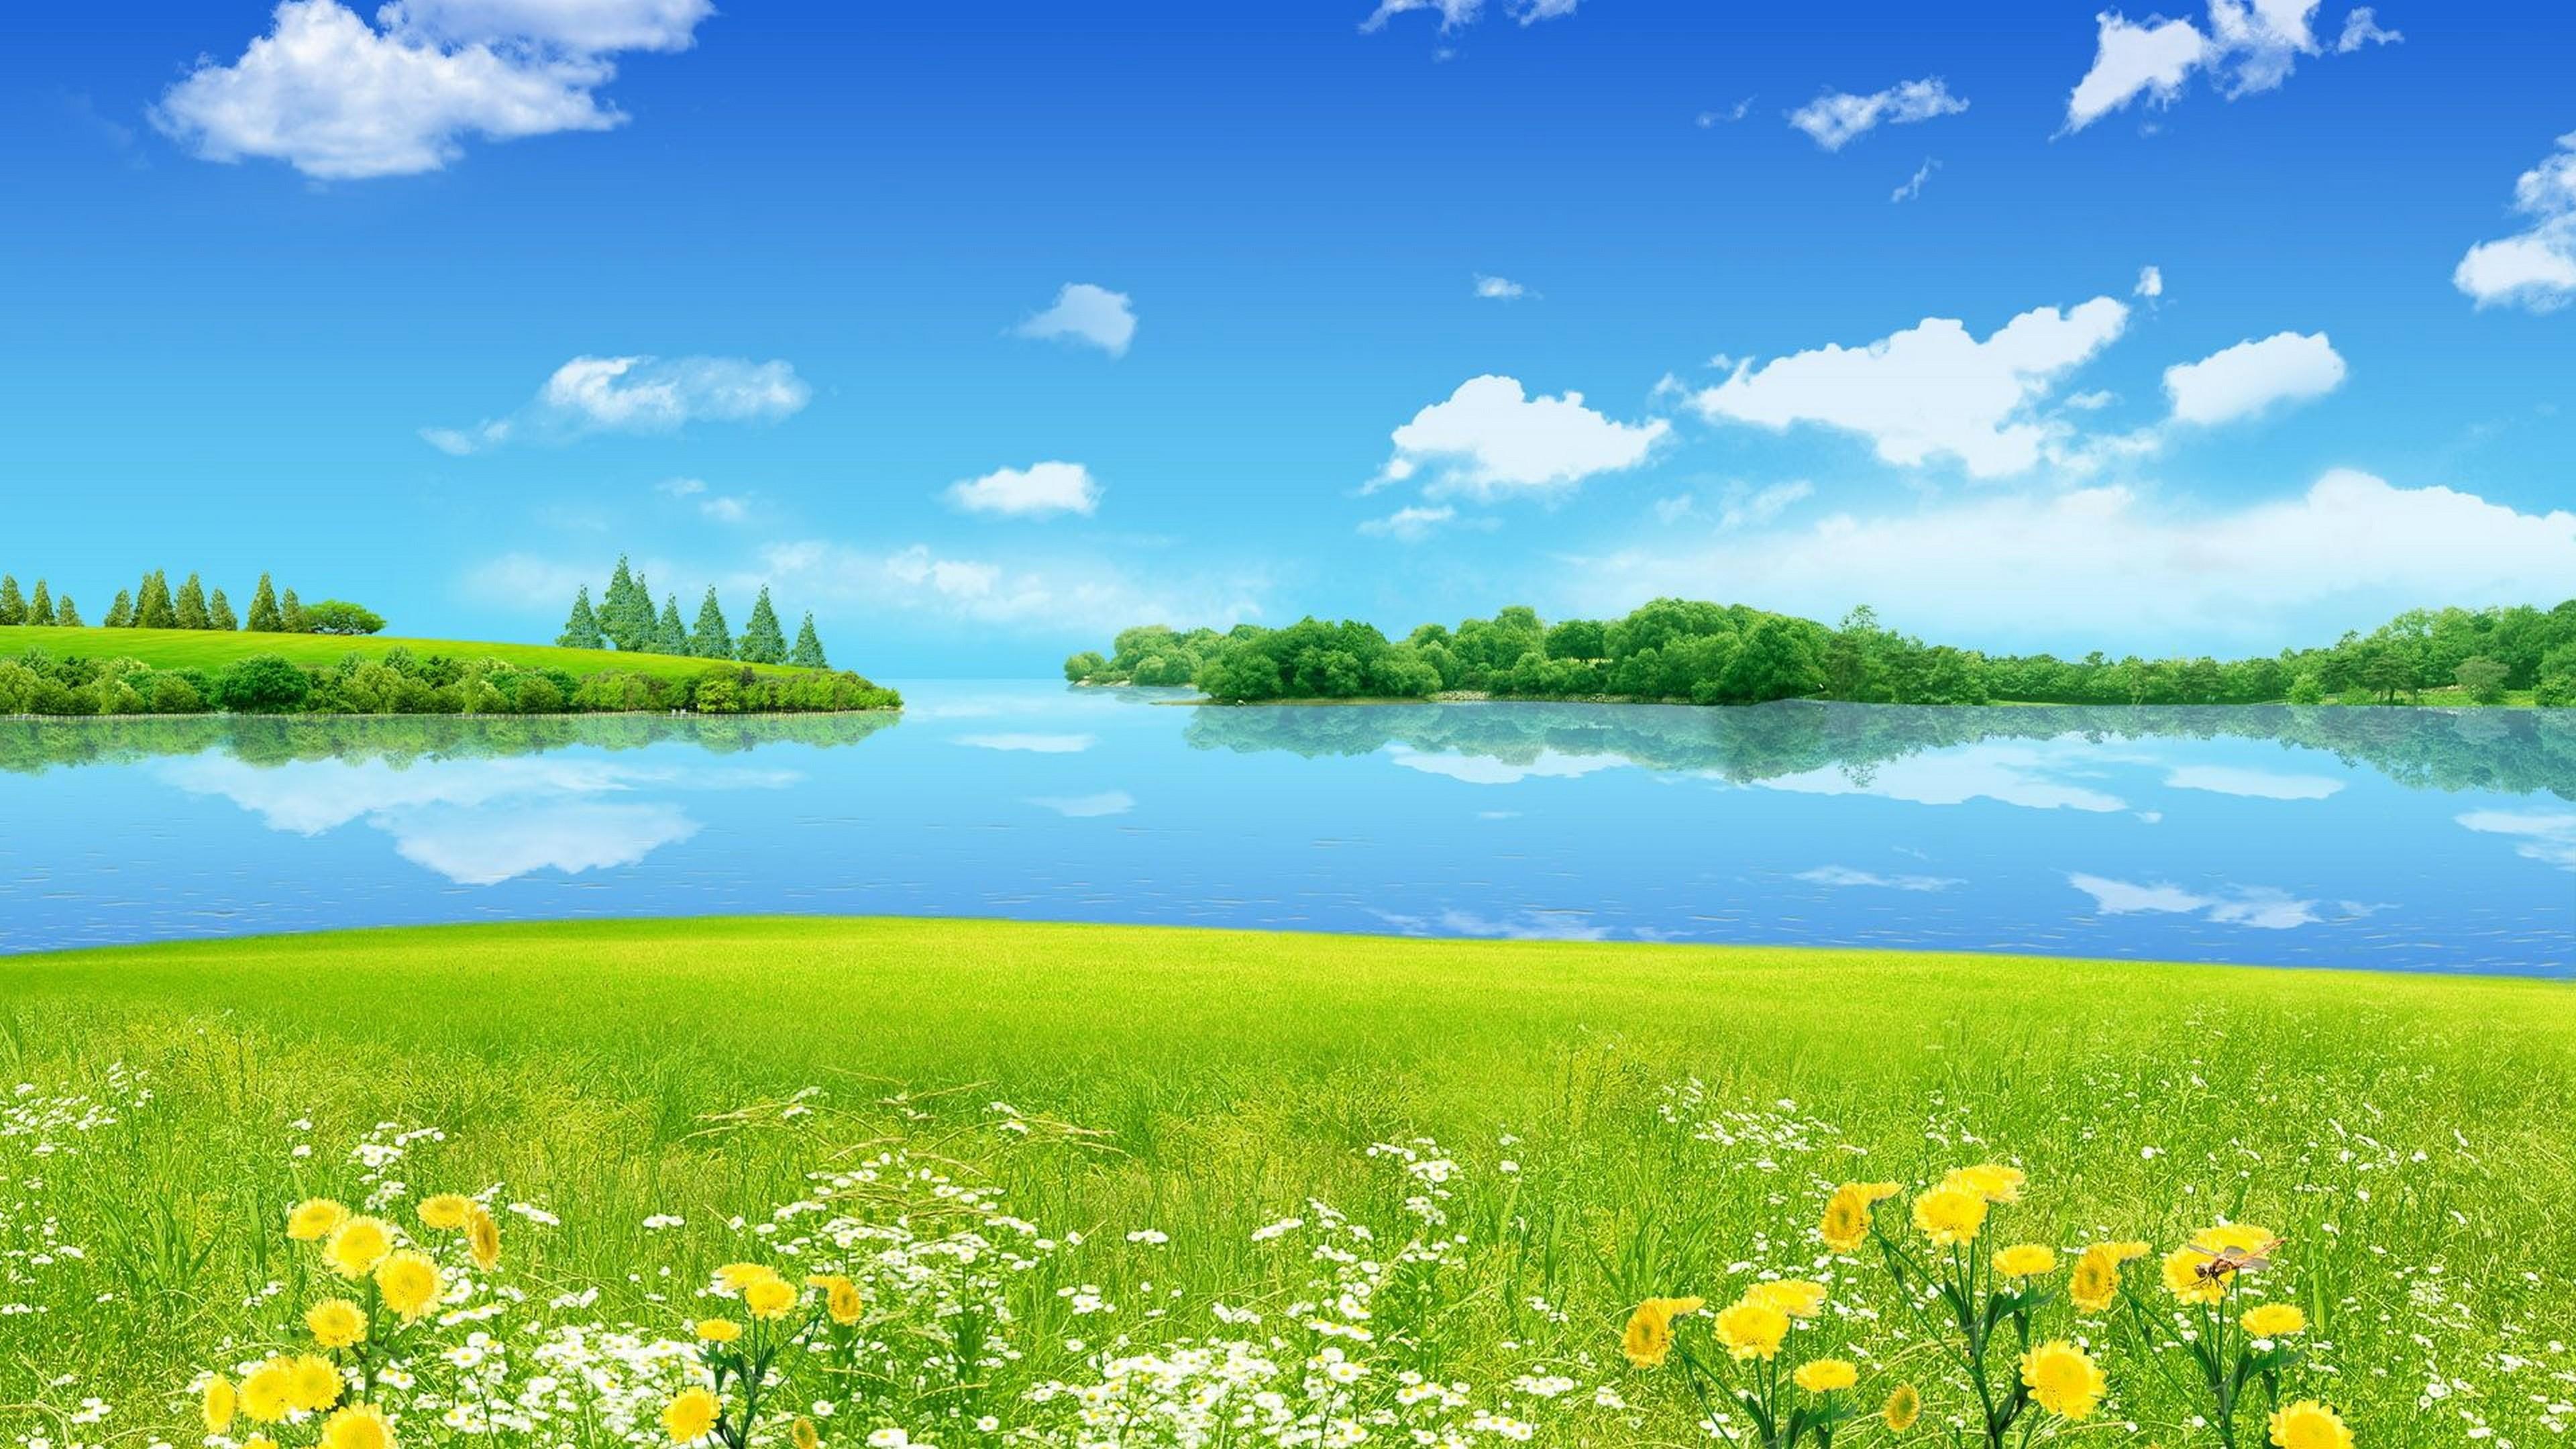 Summer Landscape Meadow With Green Grass Wild Flowers Blue Sky 3840x2160